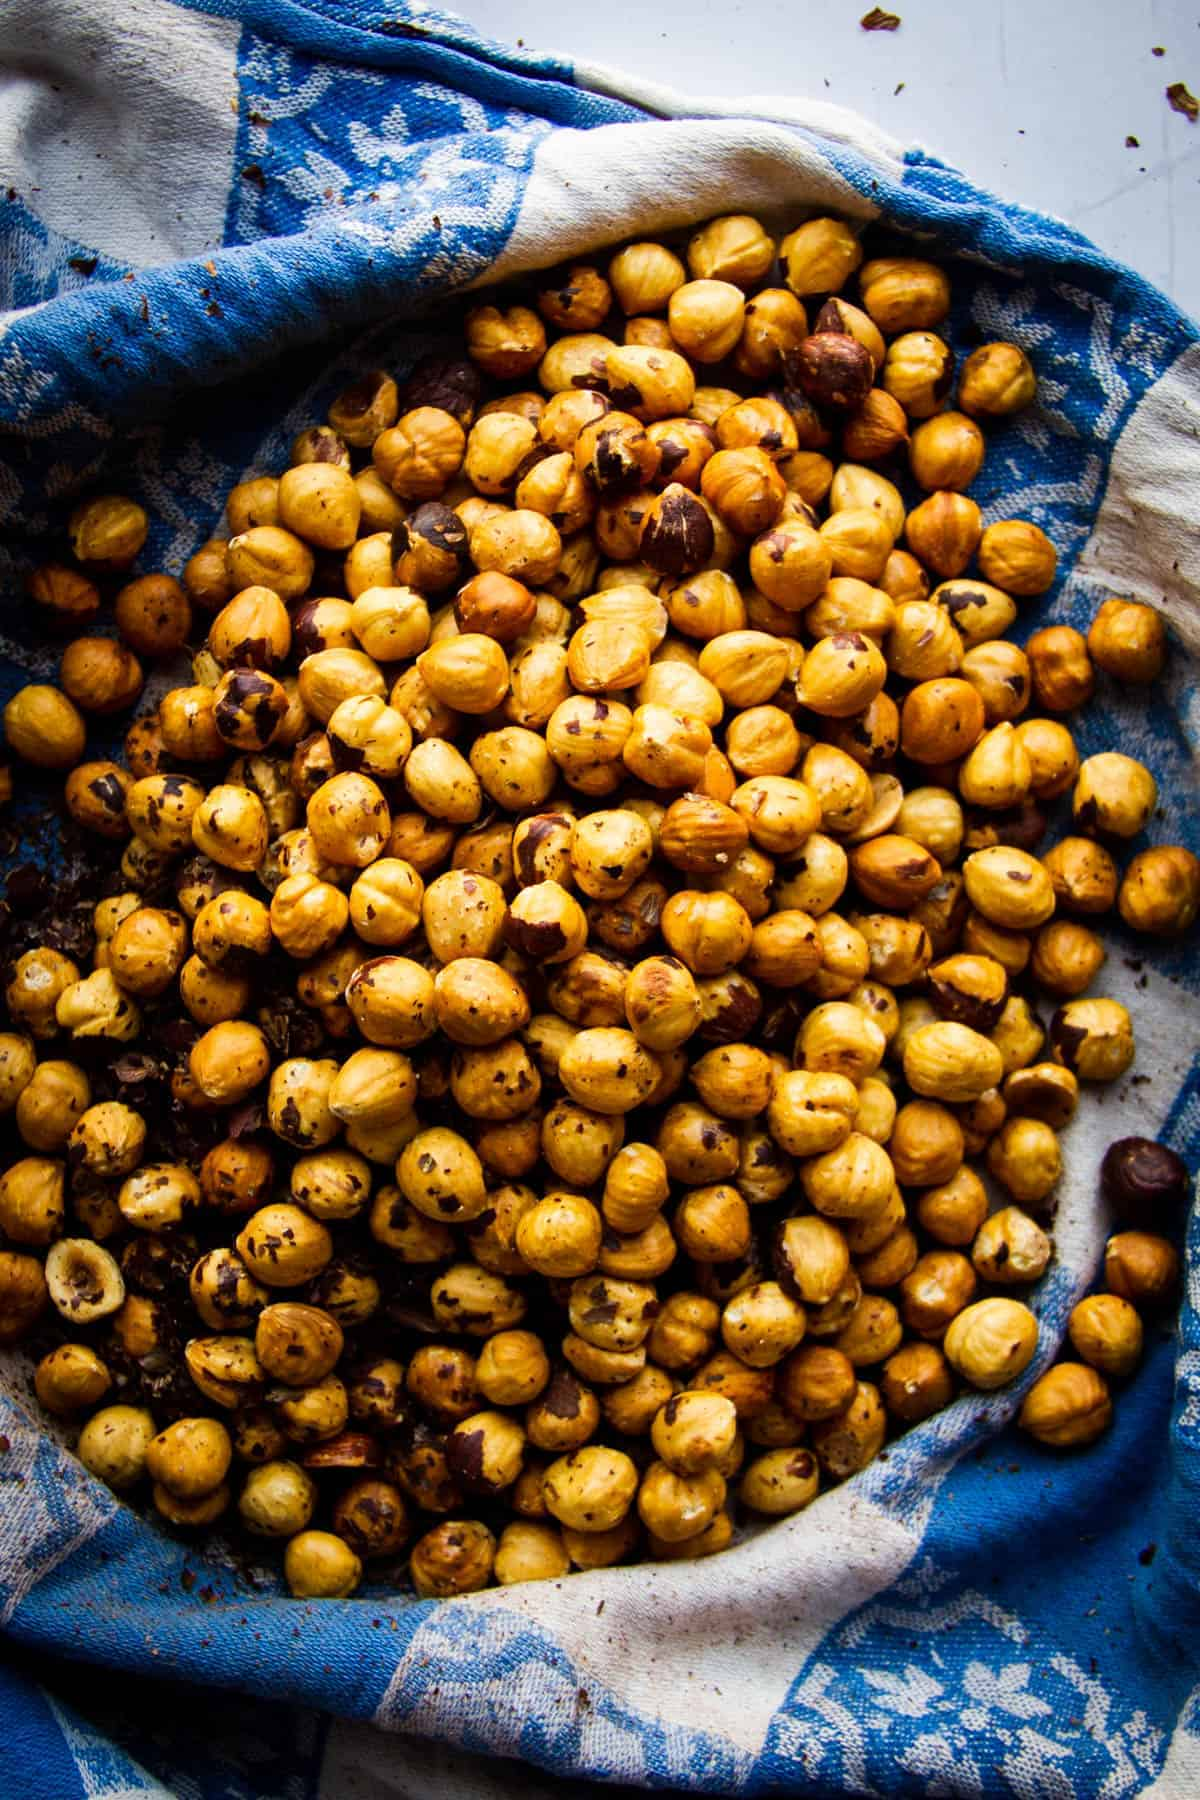 roasted-hazelnuts-in-a-blue-cloth